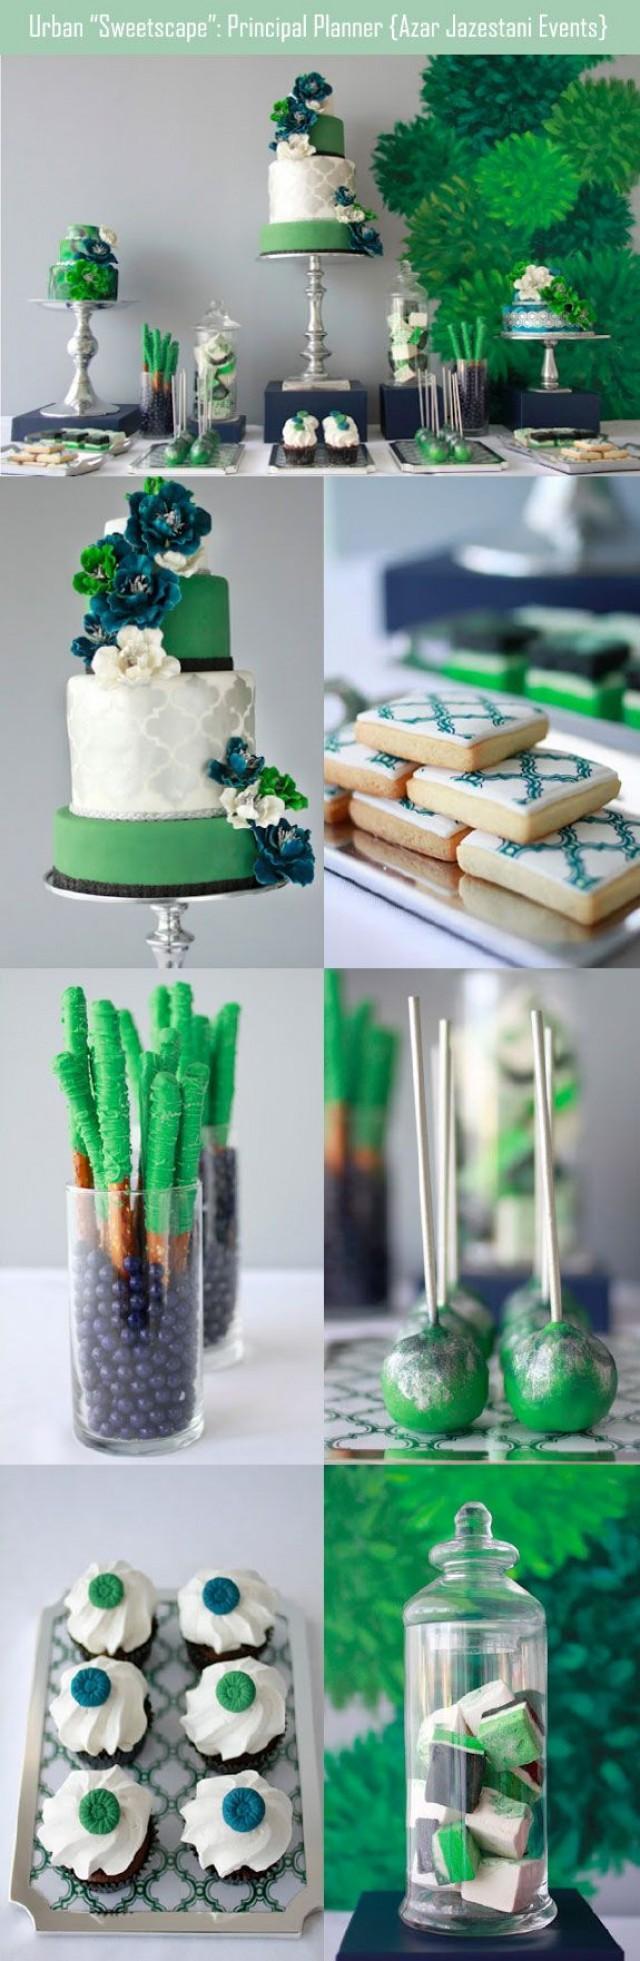 Matrimonio Tema Green : Matrimonio a tema green wedding weddbook